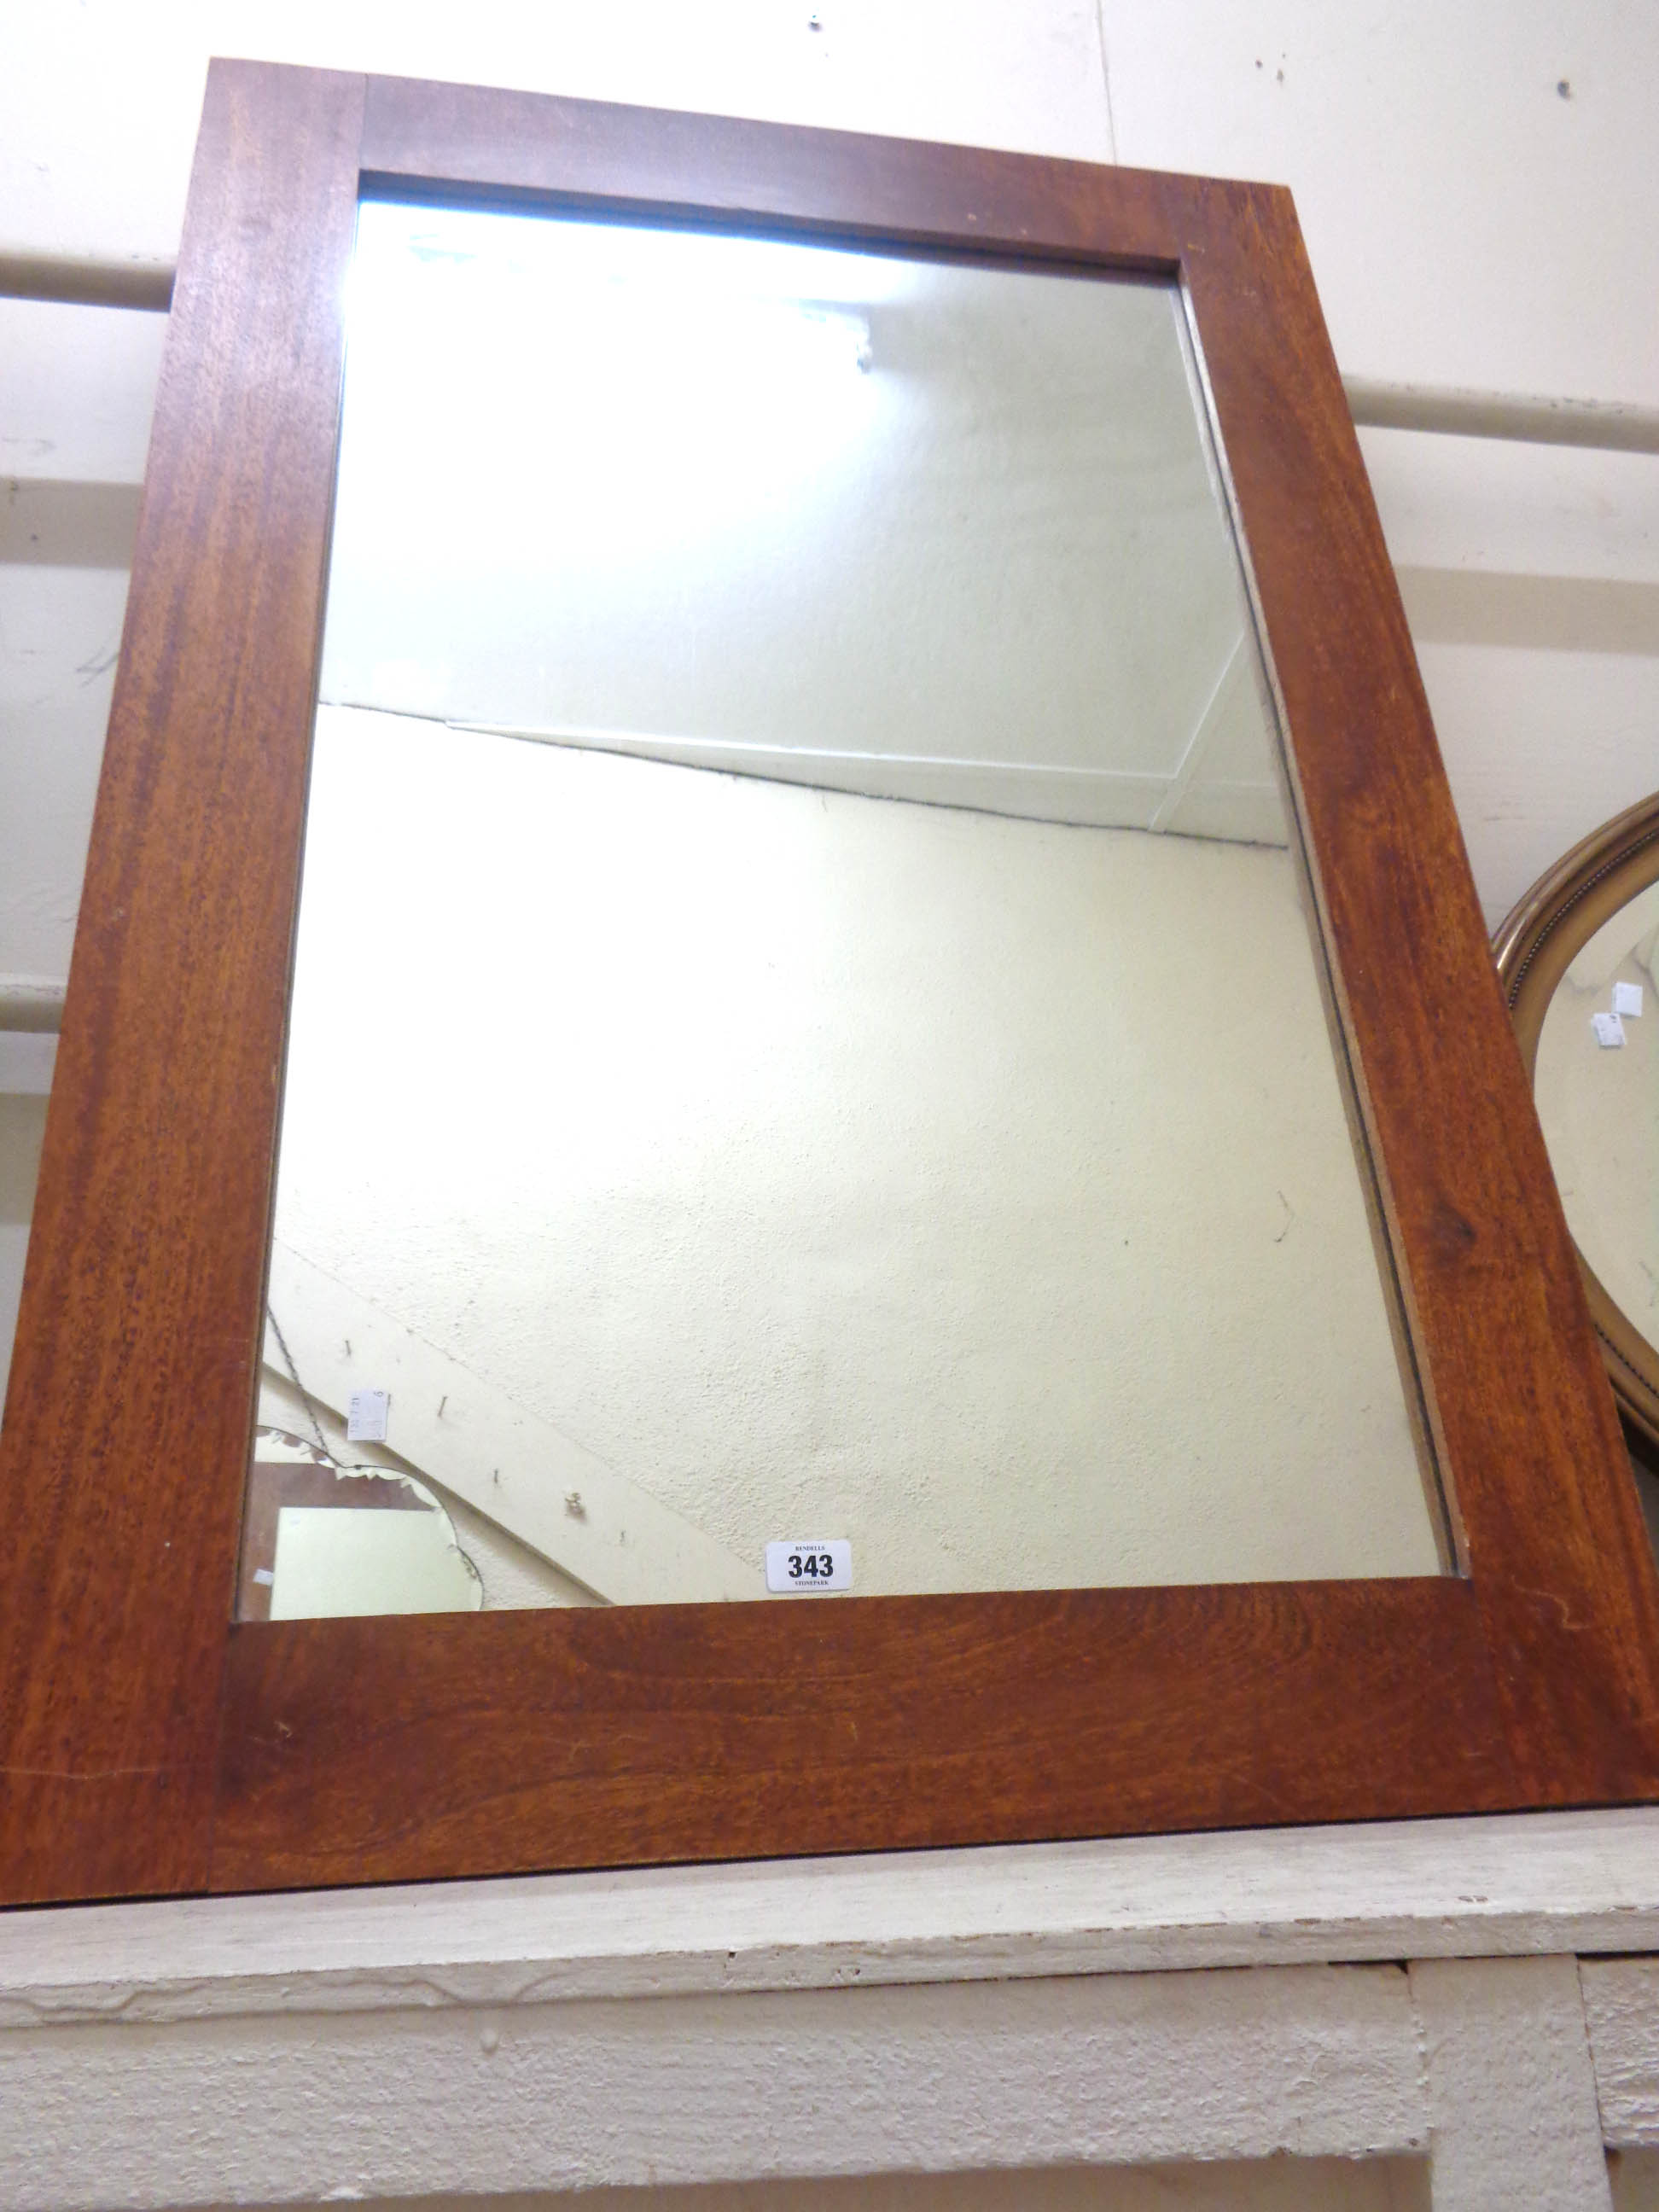 A 1.1m X 76cm modern hardwood framed oblong wall mirror